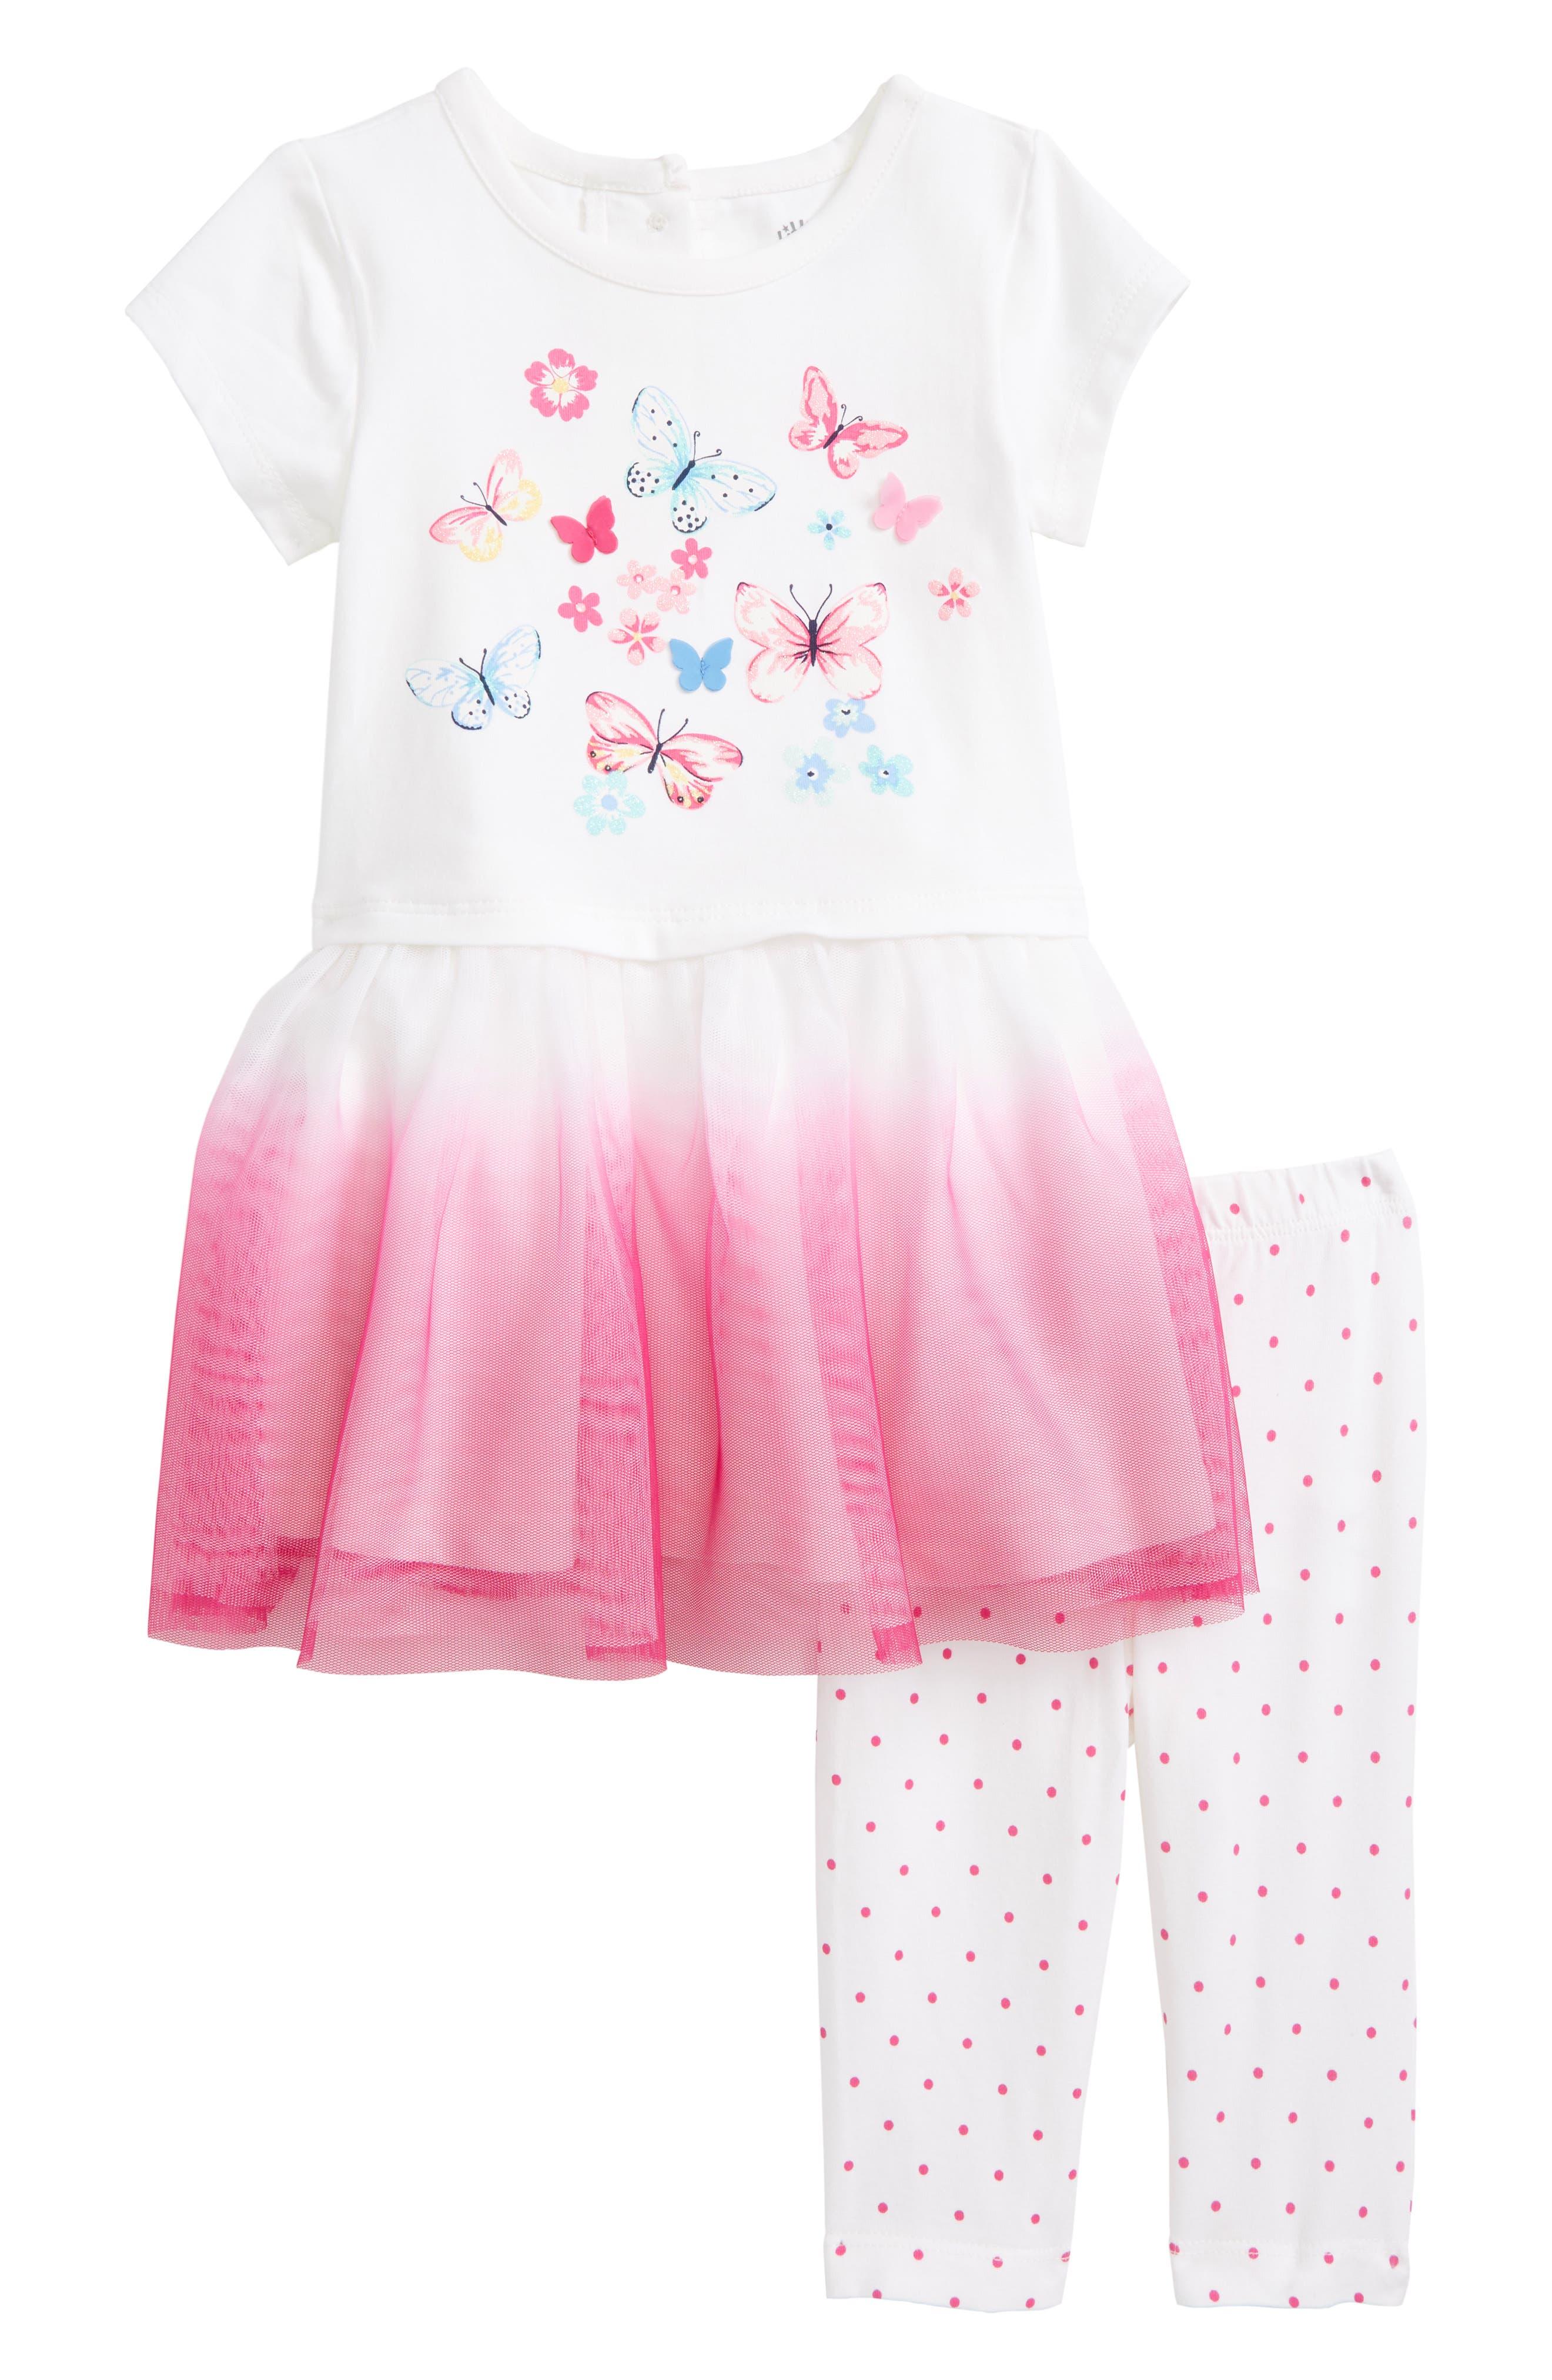 Baby Girls Clothing Dresses Bodysuits & Footies